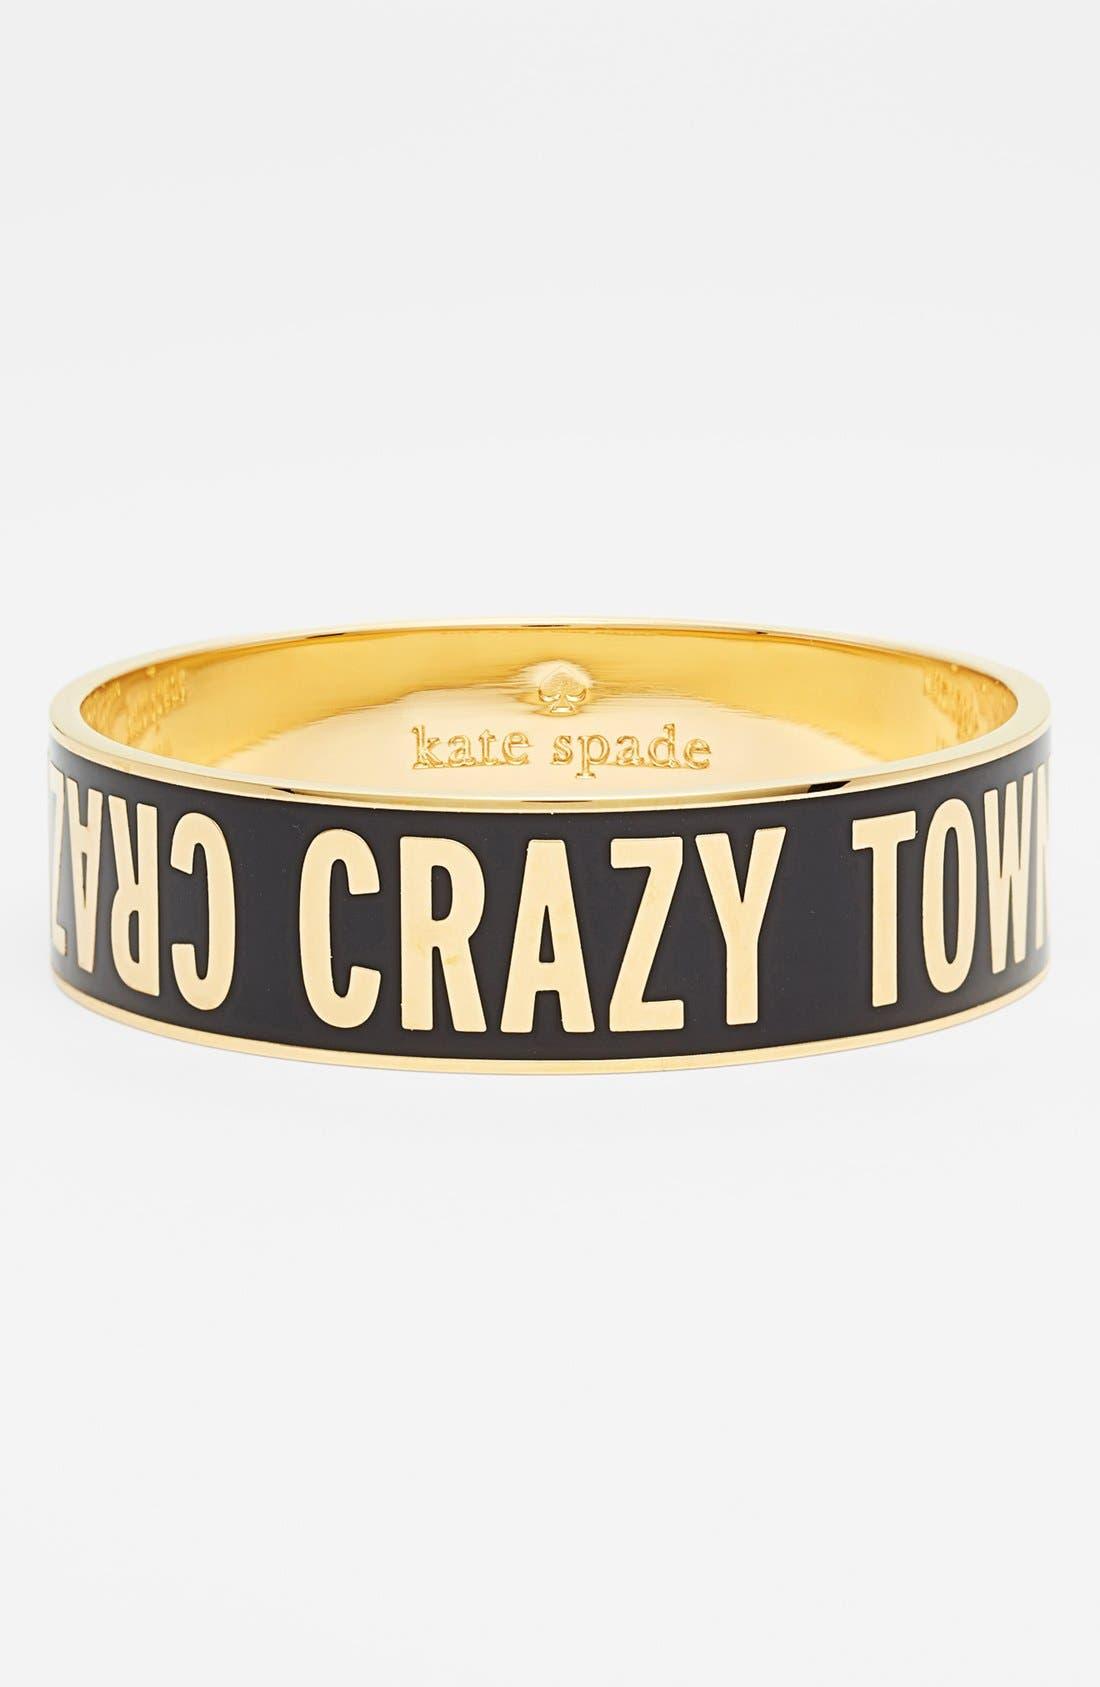 Main Image - kate spade new york 'idiom - crazy town' bangle